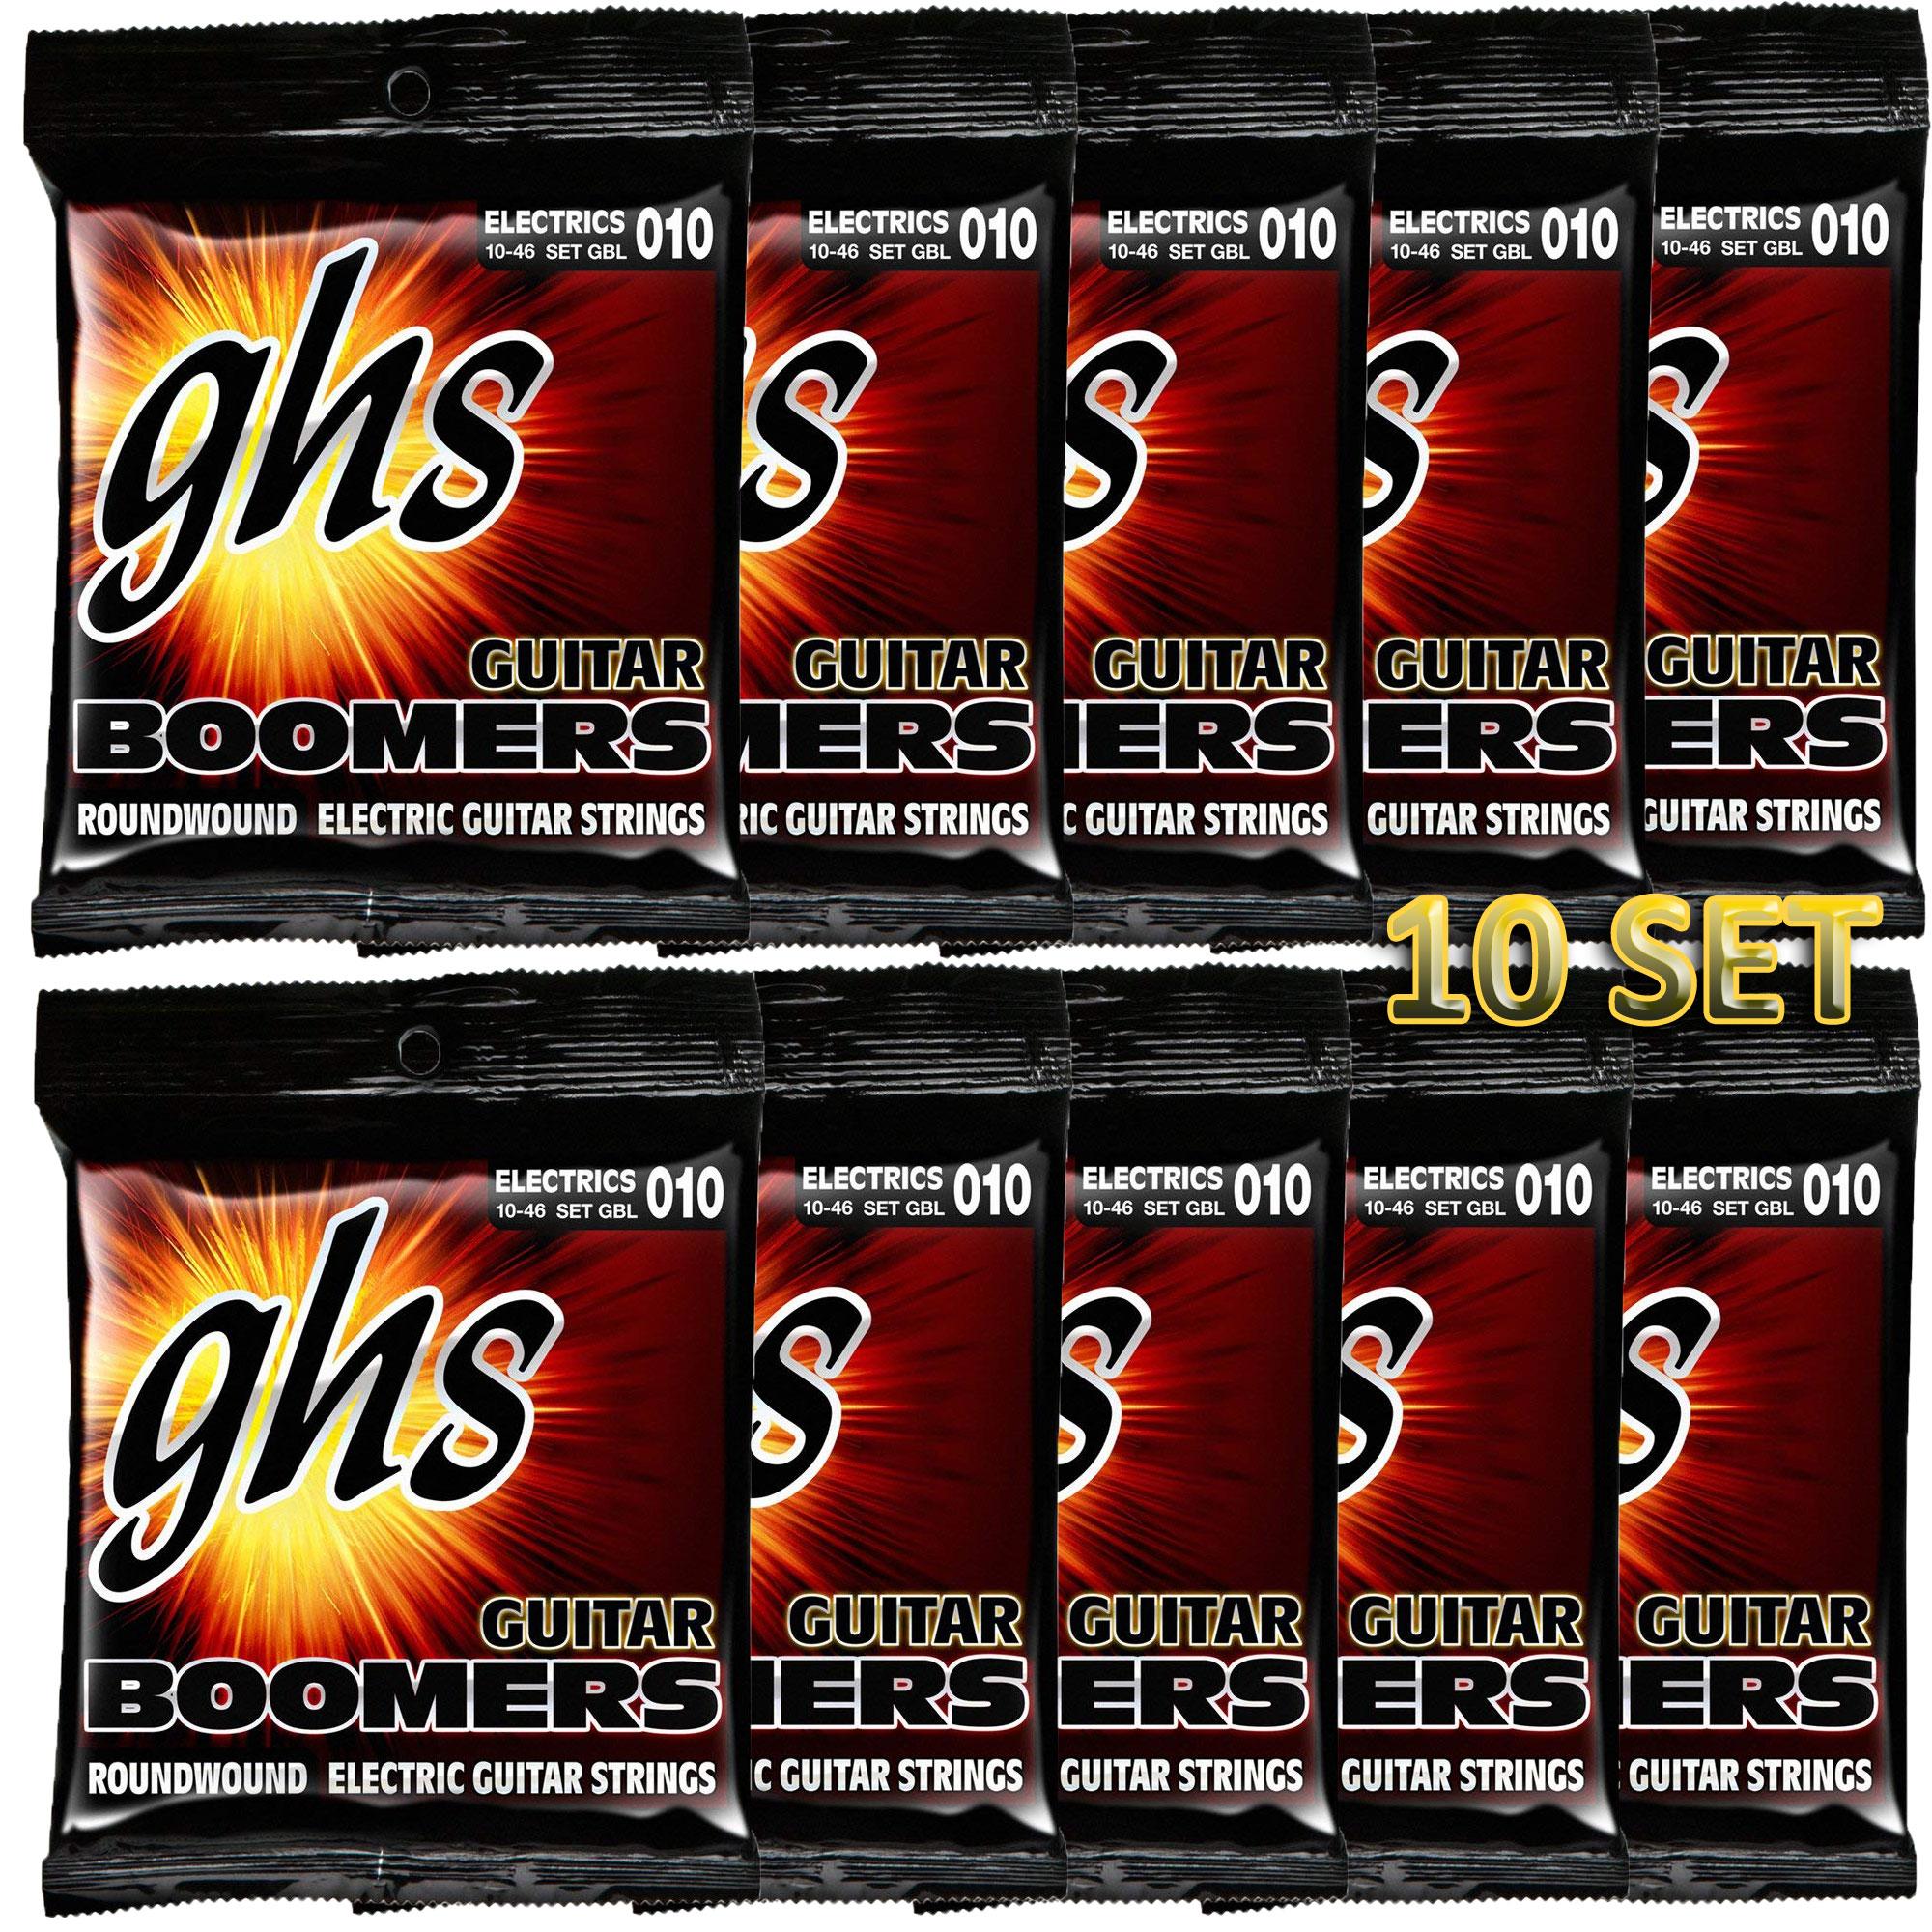 GHS GBL - 10 SET ELETTRICA 10-46